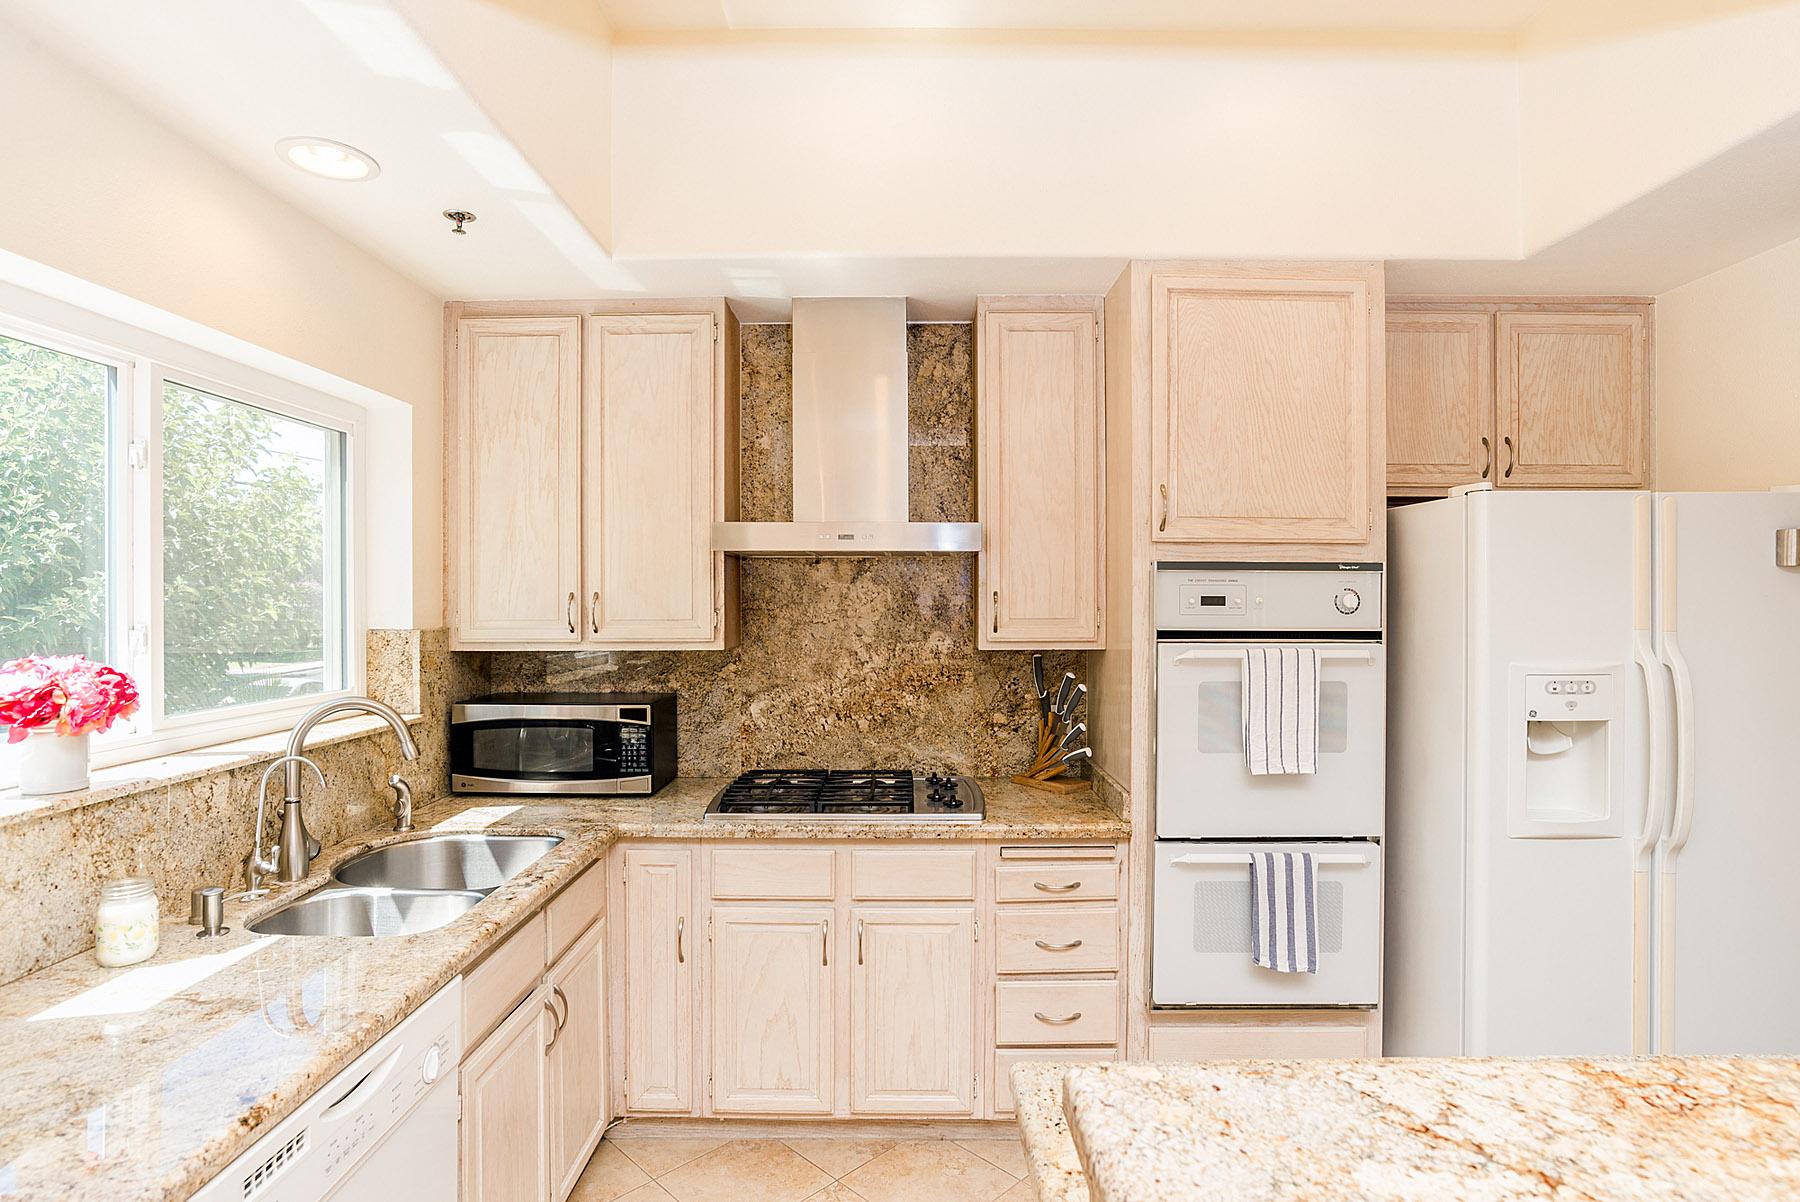 Light and bright kitchen, with plenty of storage.